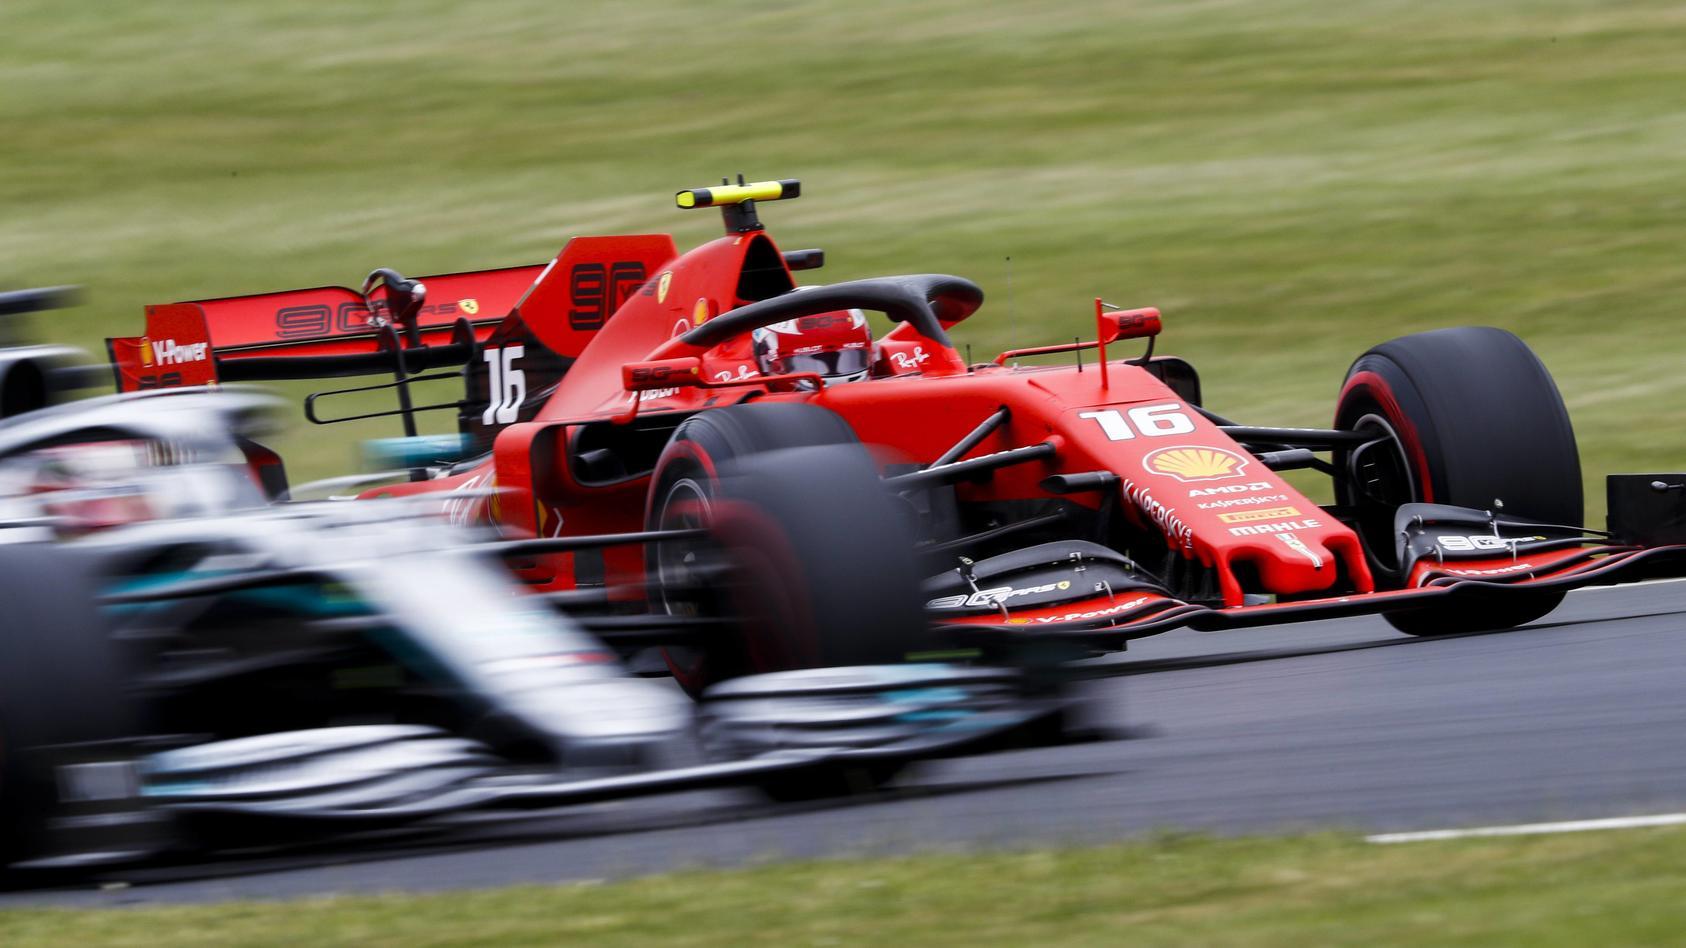 2019 British GP SILVERSTONE UNITED KINGDOM JULY 13 Charles Leclerc Ferrari SF90 passes Lewis H